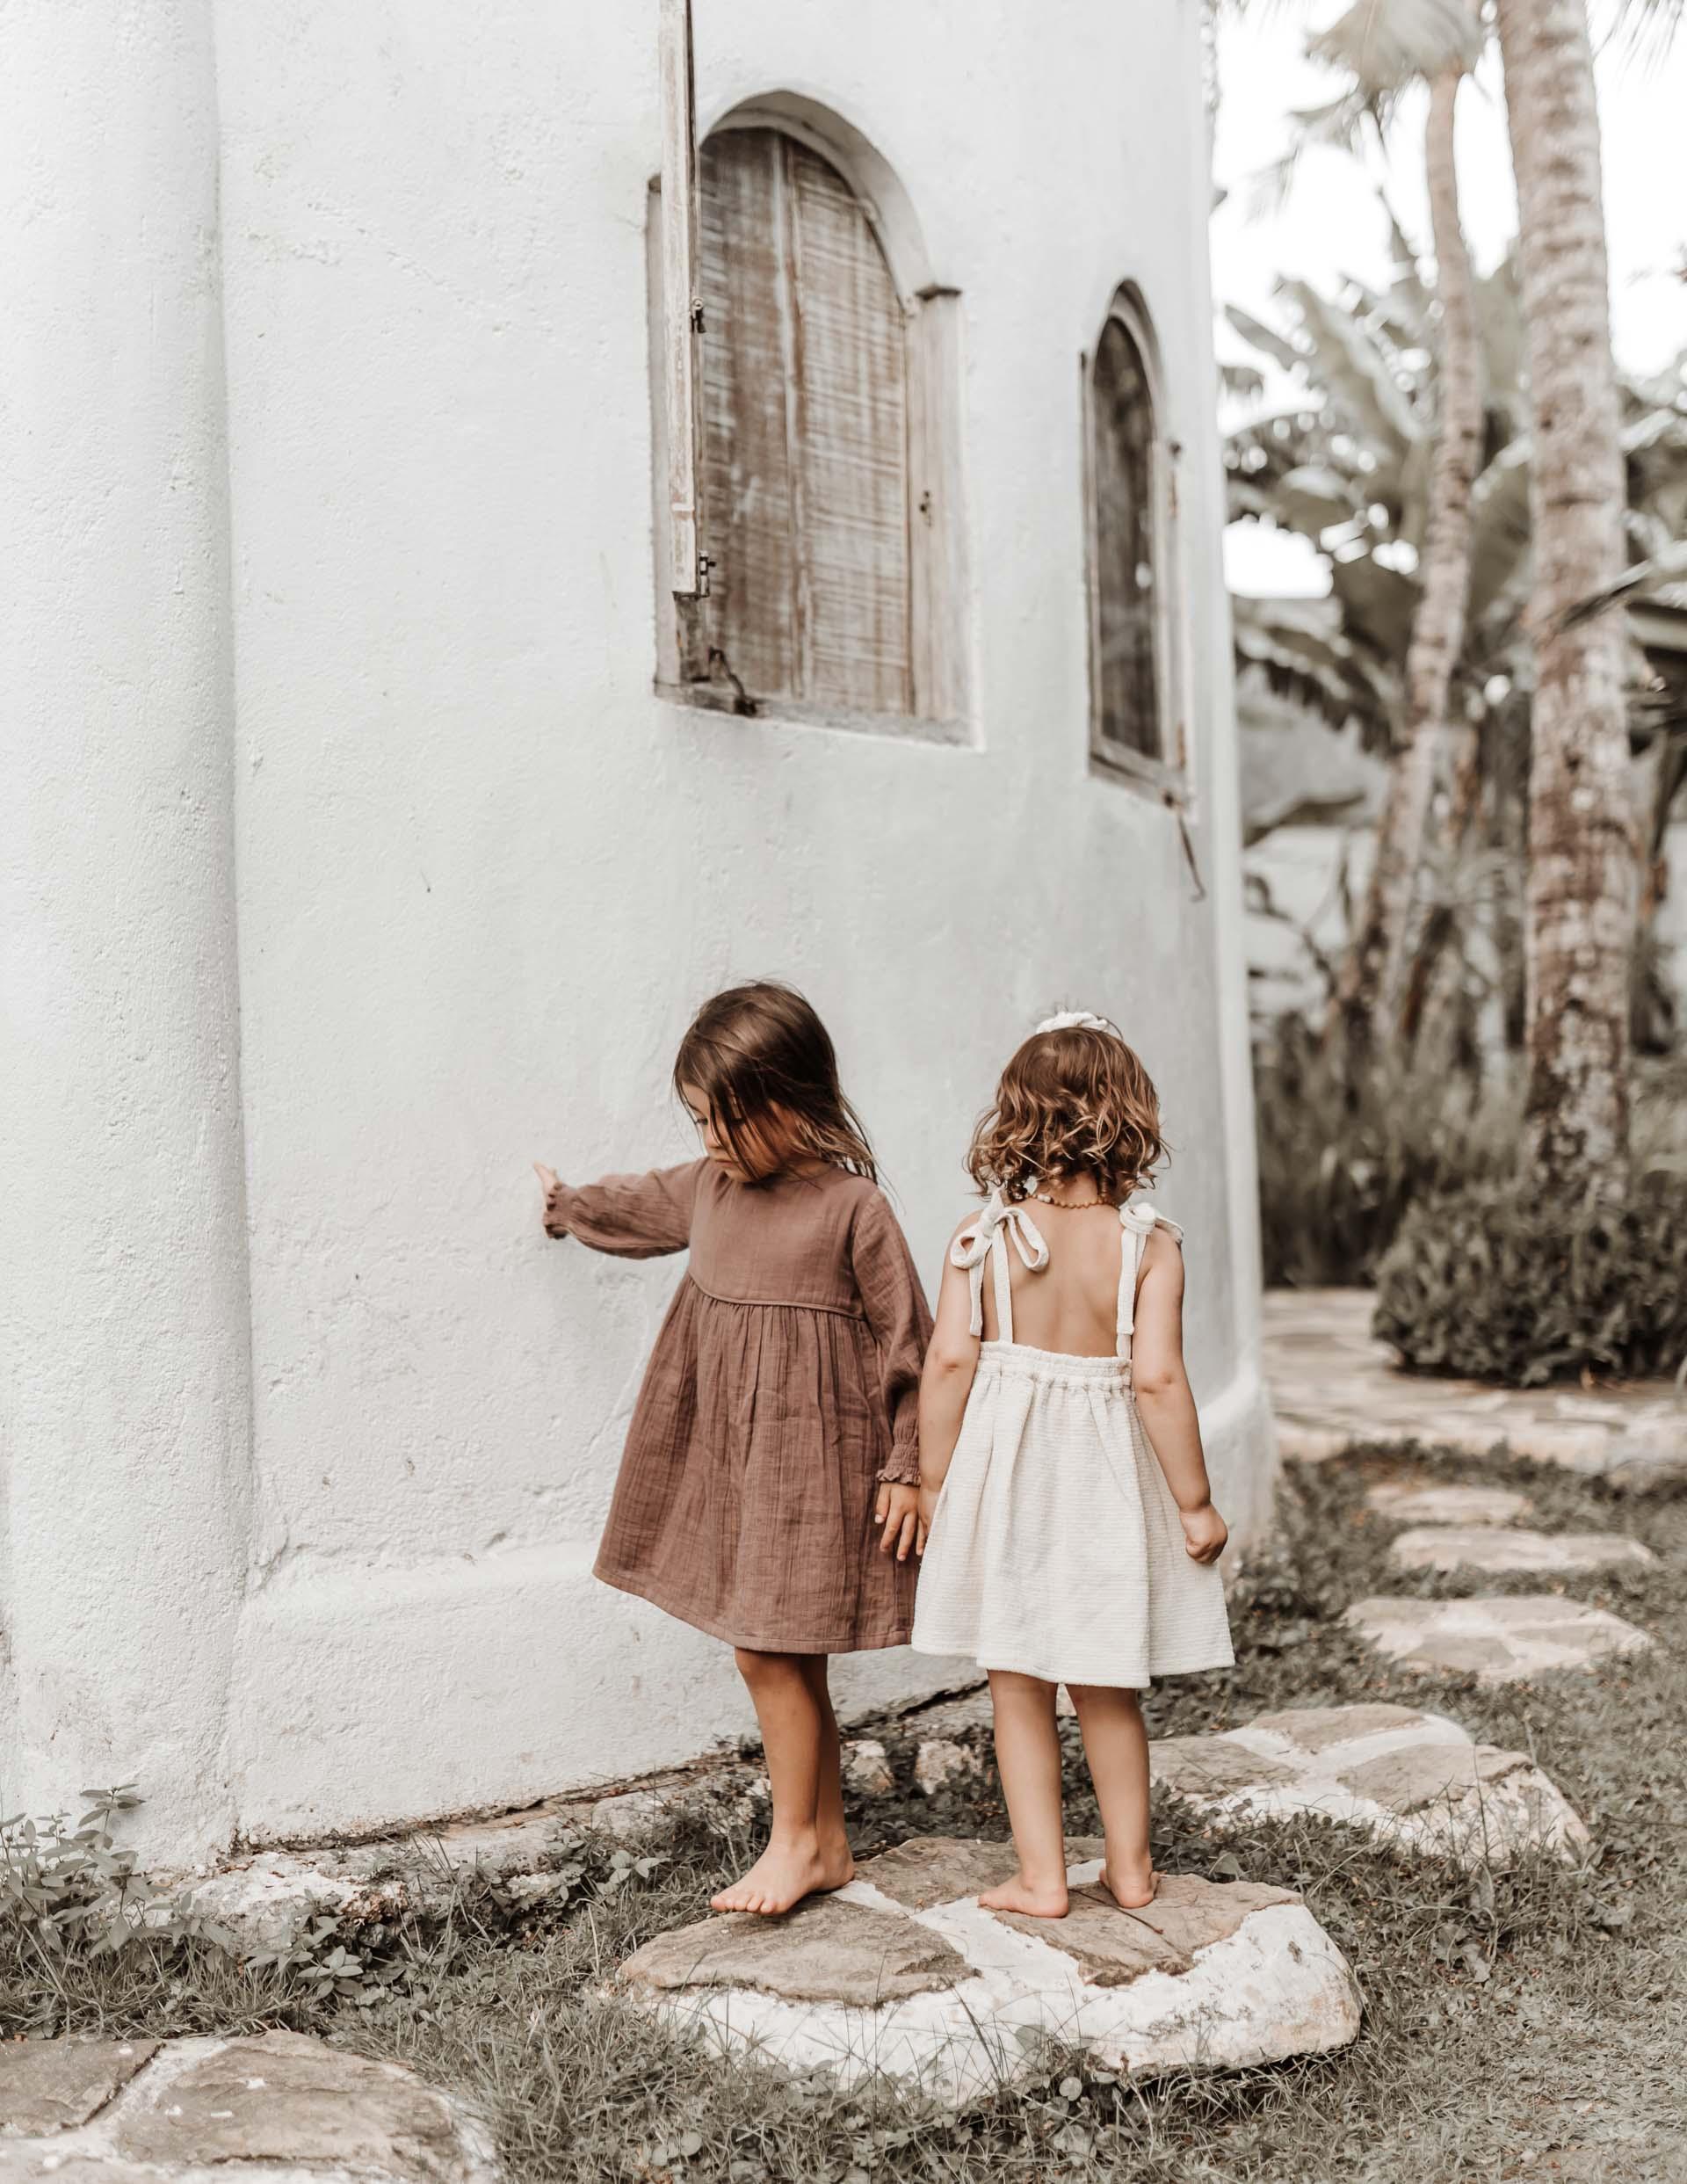 keira-mason-illoura-the-label-outside-girls.jpg